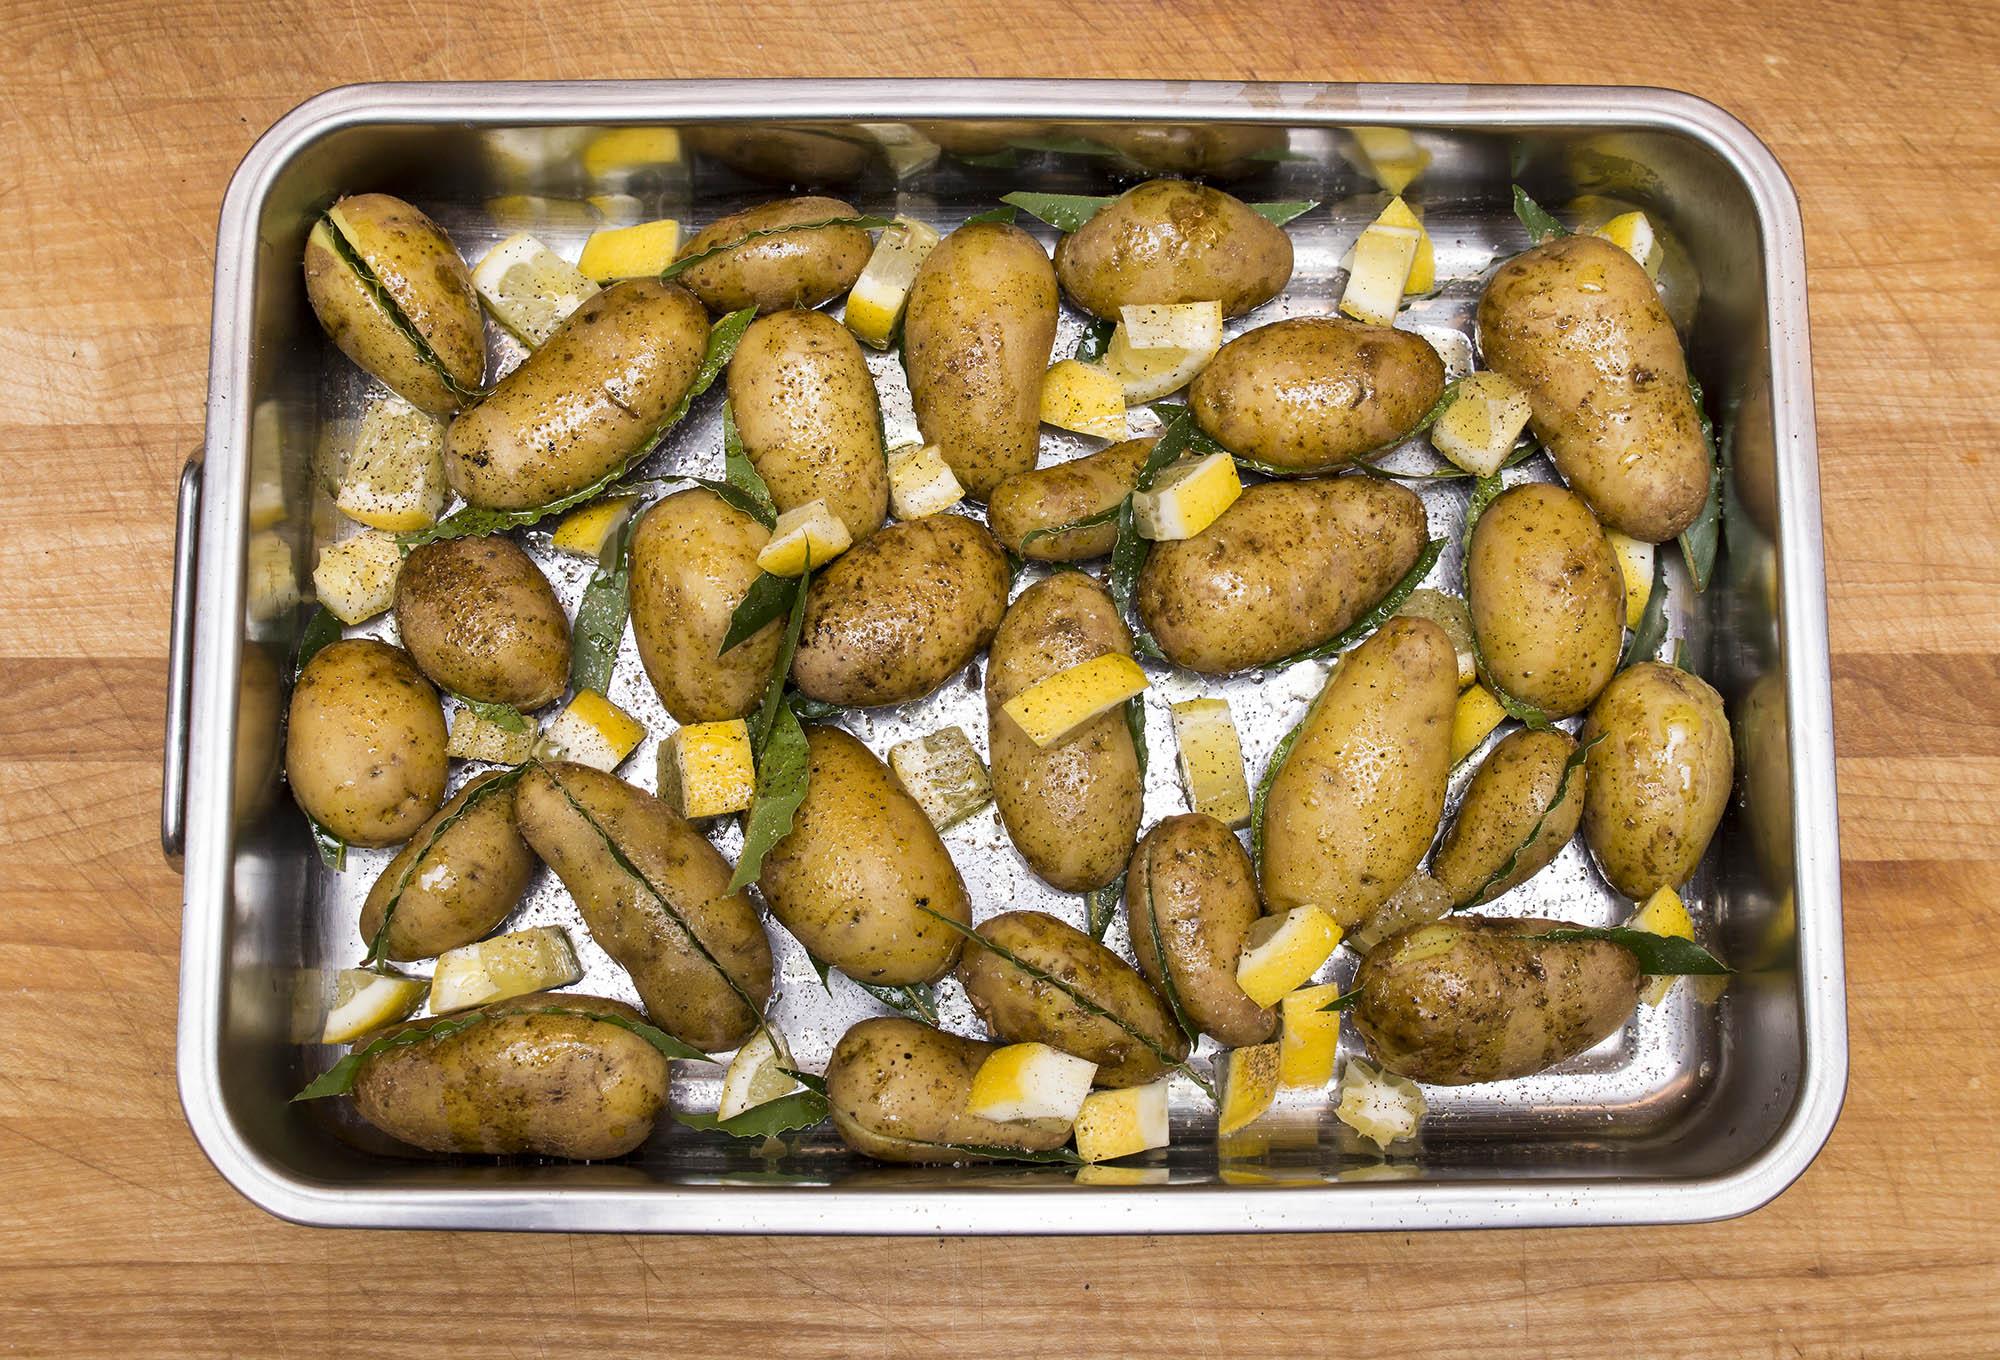 Lorbeer-Zitronen-Kartoffeln 001 klein.jpg